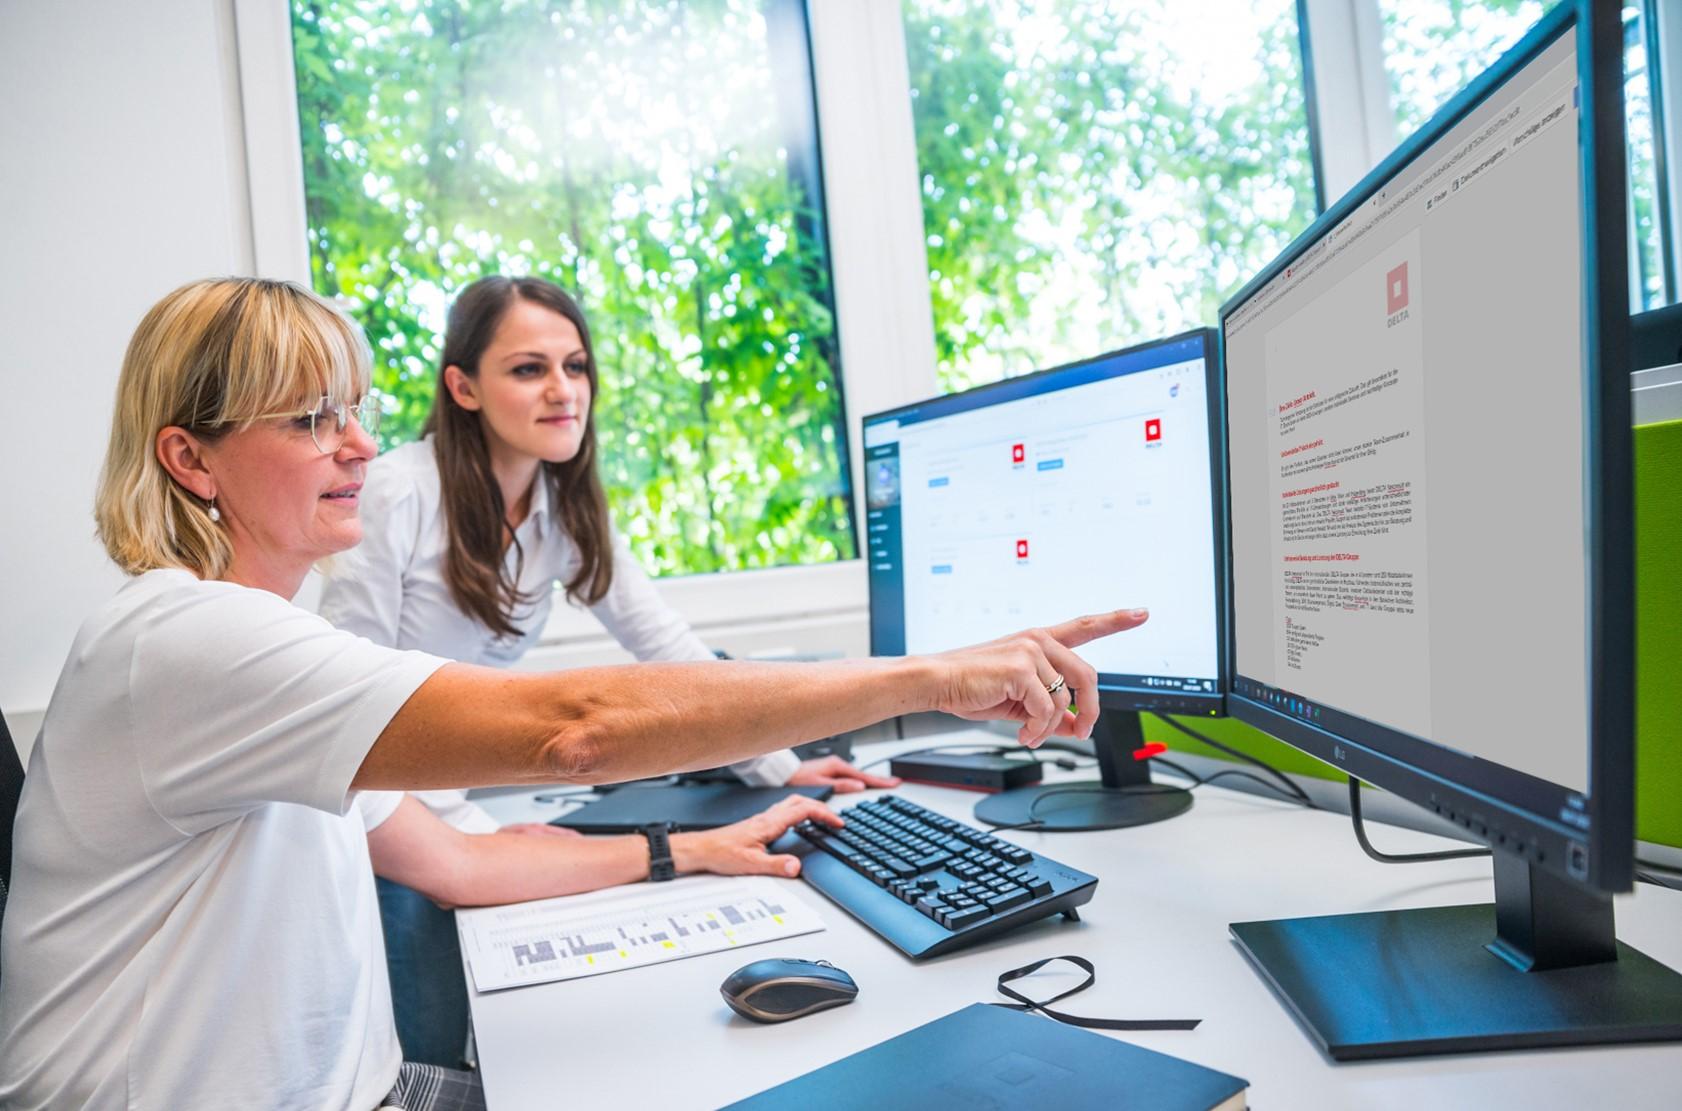 Workspace_Datenpool_Online Editing